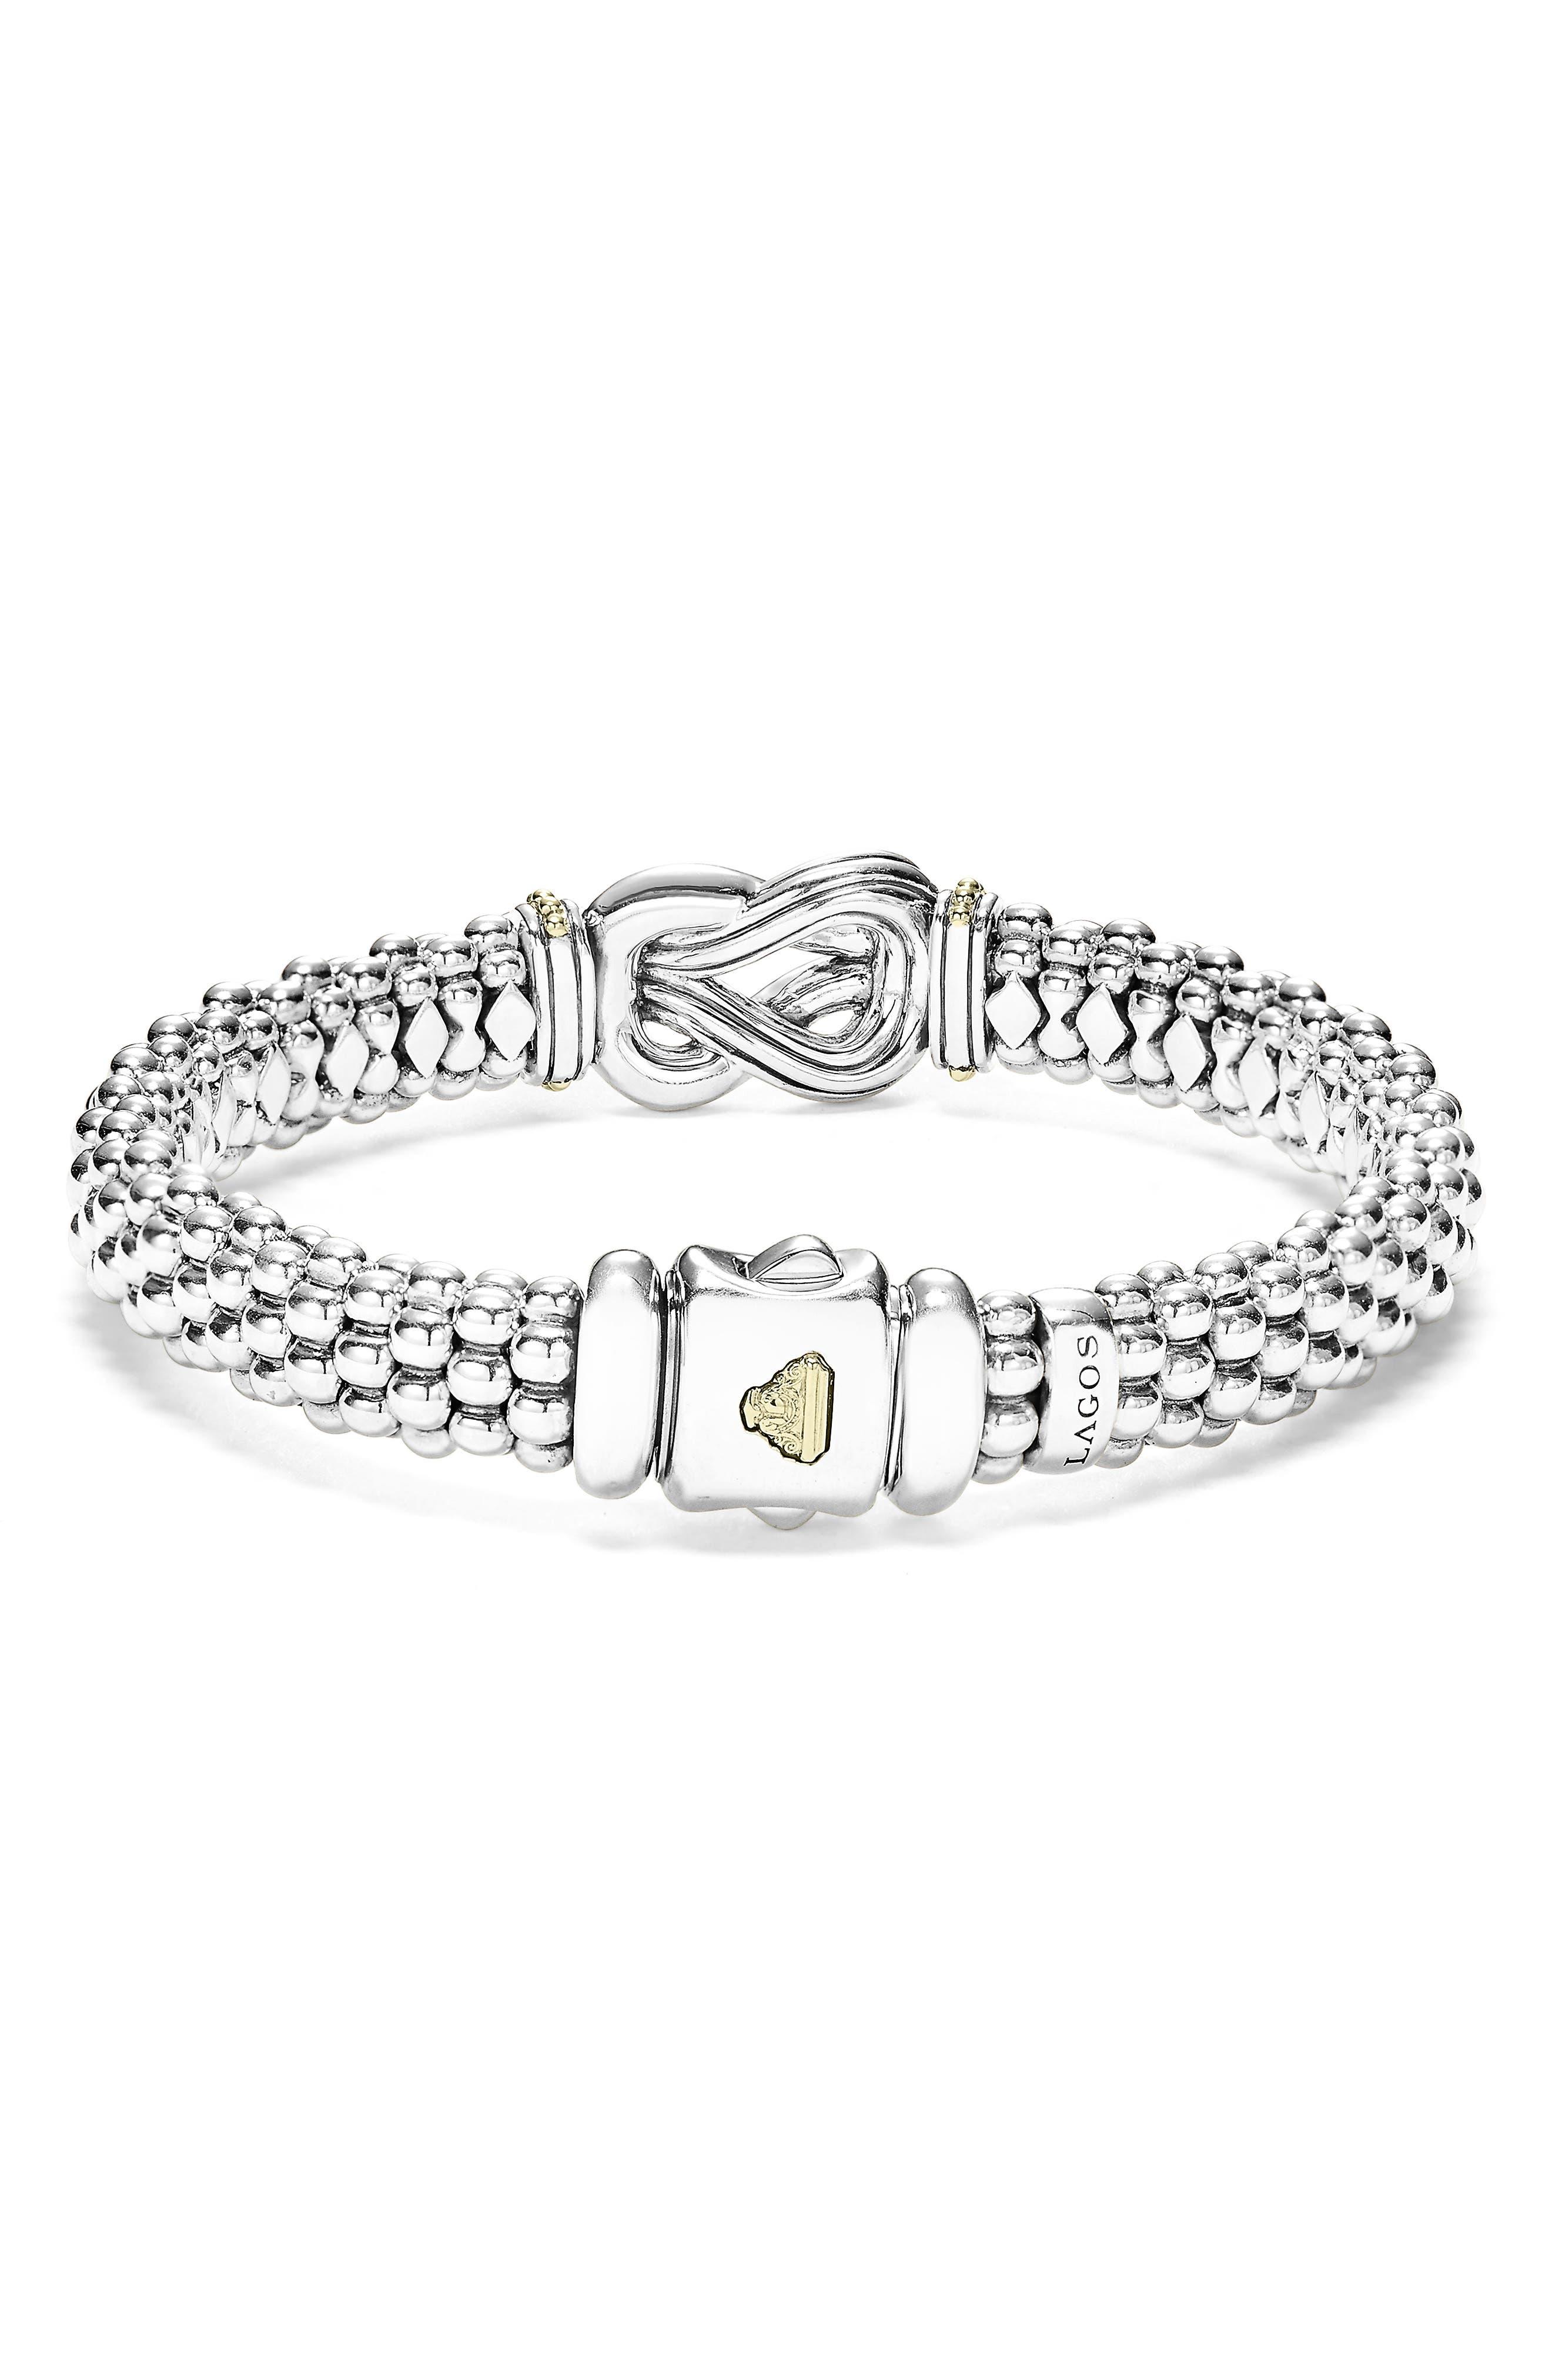 Caviar Newport Diamond Station Bracelet,                             Alternate thumbnail 5, color,                             SILVER/ GOLD